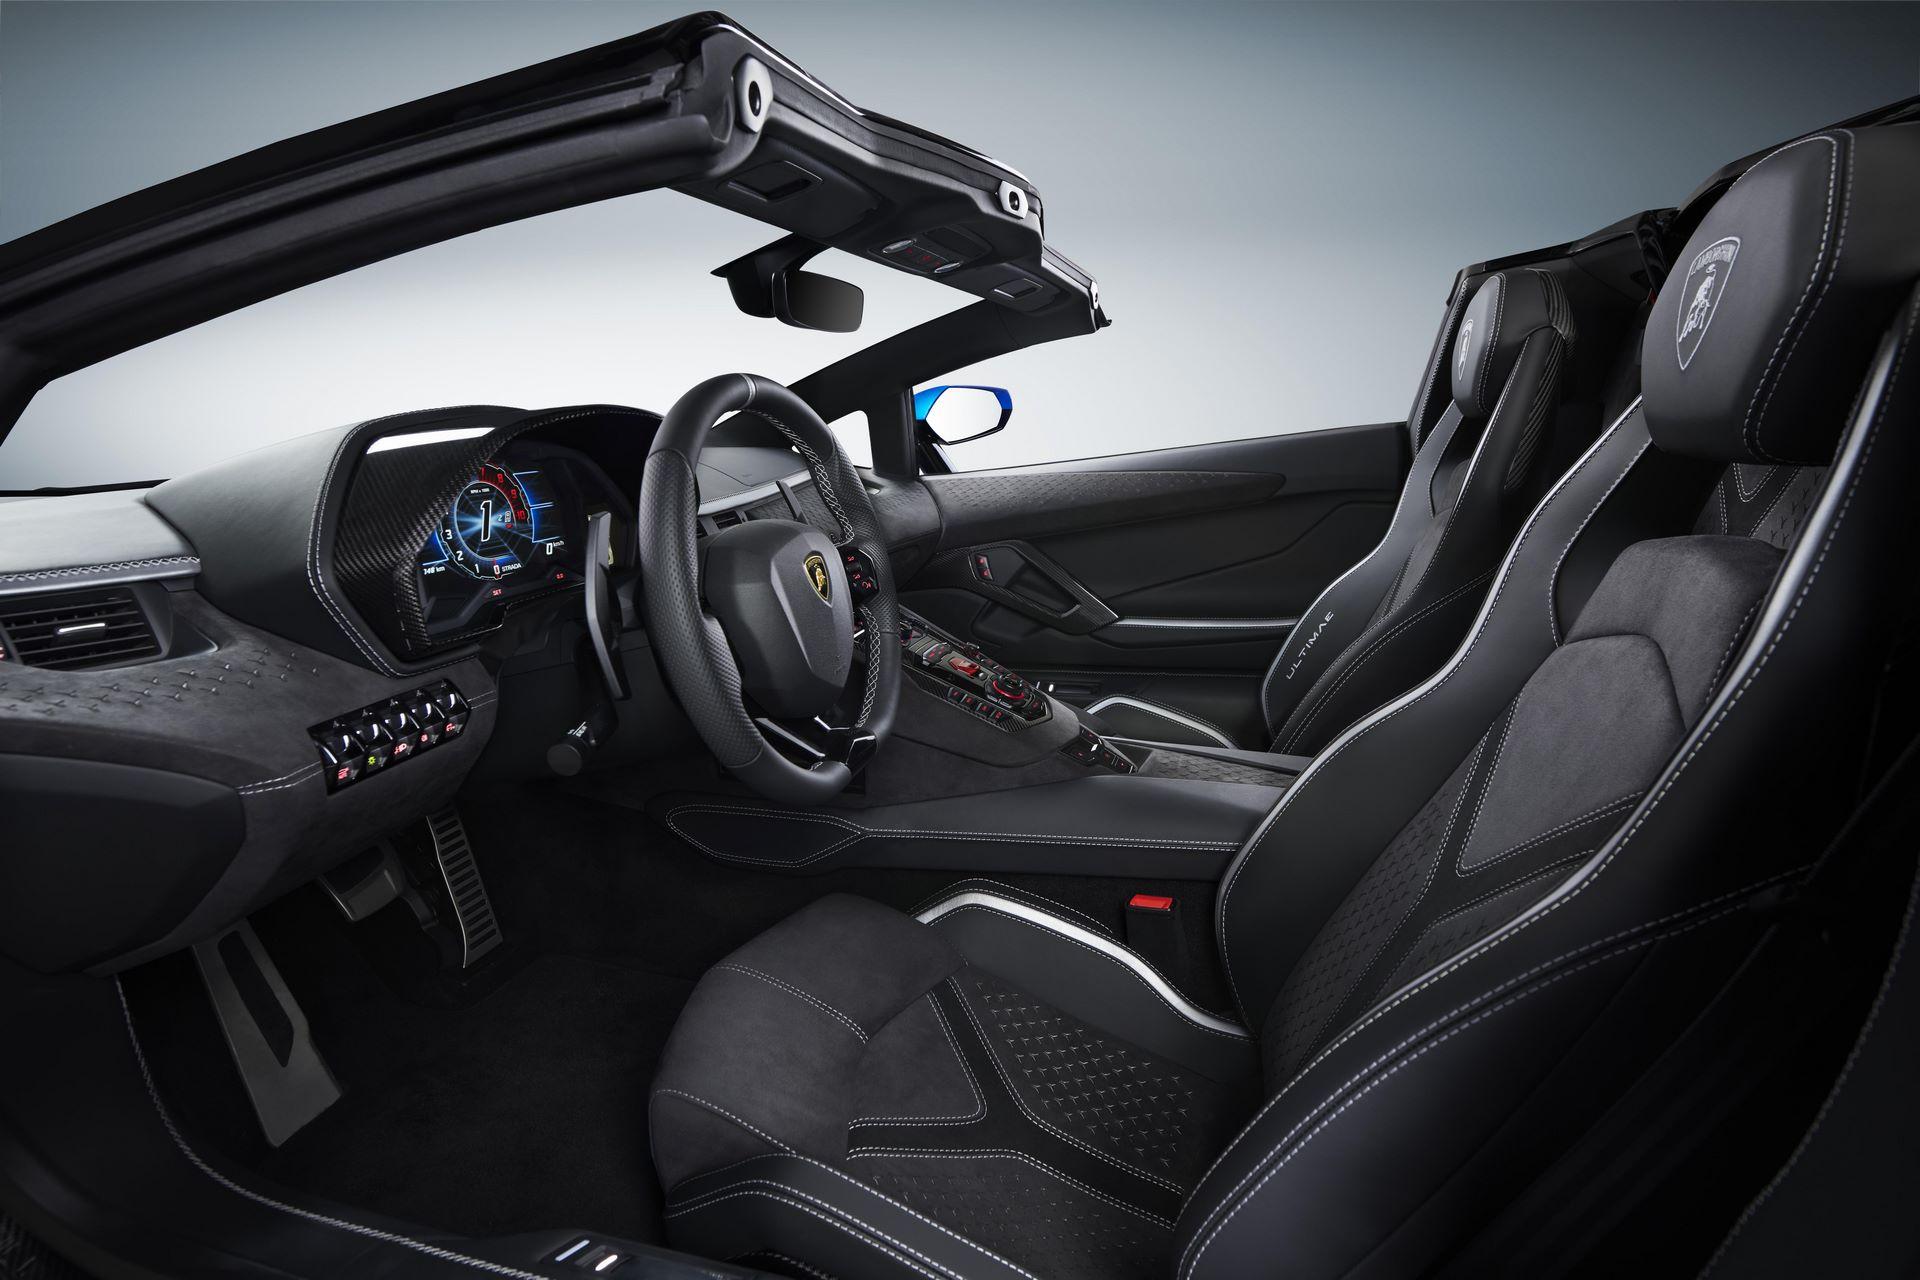 Lamborghini-Aventador-LP780-4-Ultimae-27